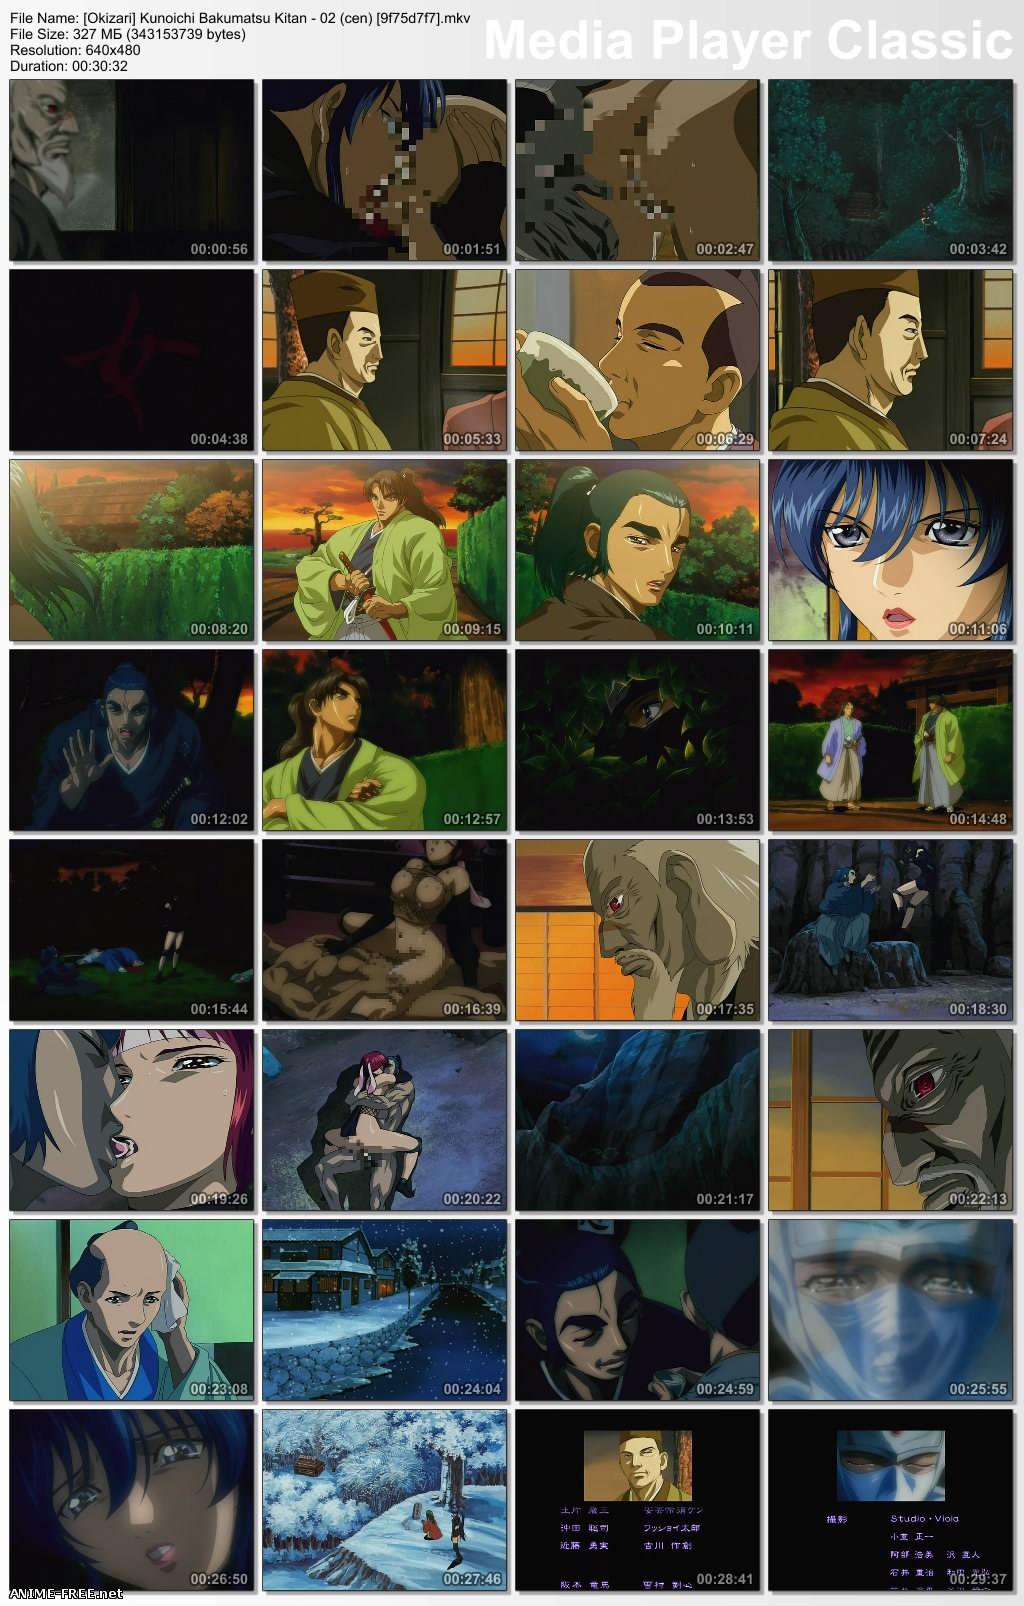 Kunoichi Bakumatsu Kitan / The Last Kunoichi / Последняя девушка-ниндзя [2 из 2] [Ptcen] [RUS,ENG,JAP] Anime Hentai